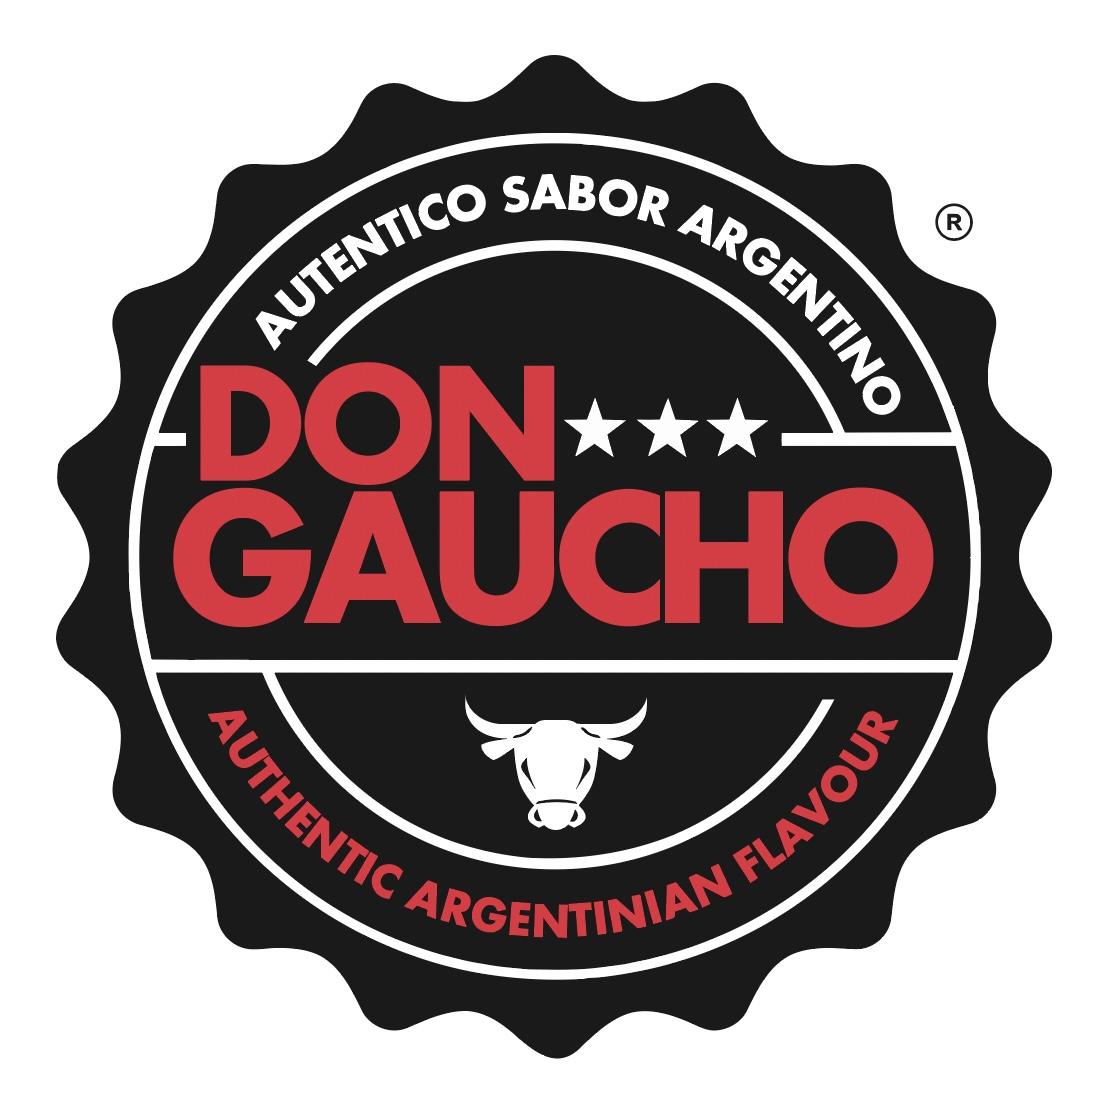 Don Gaucho